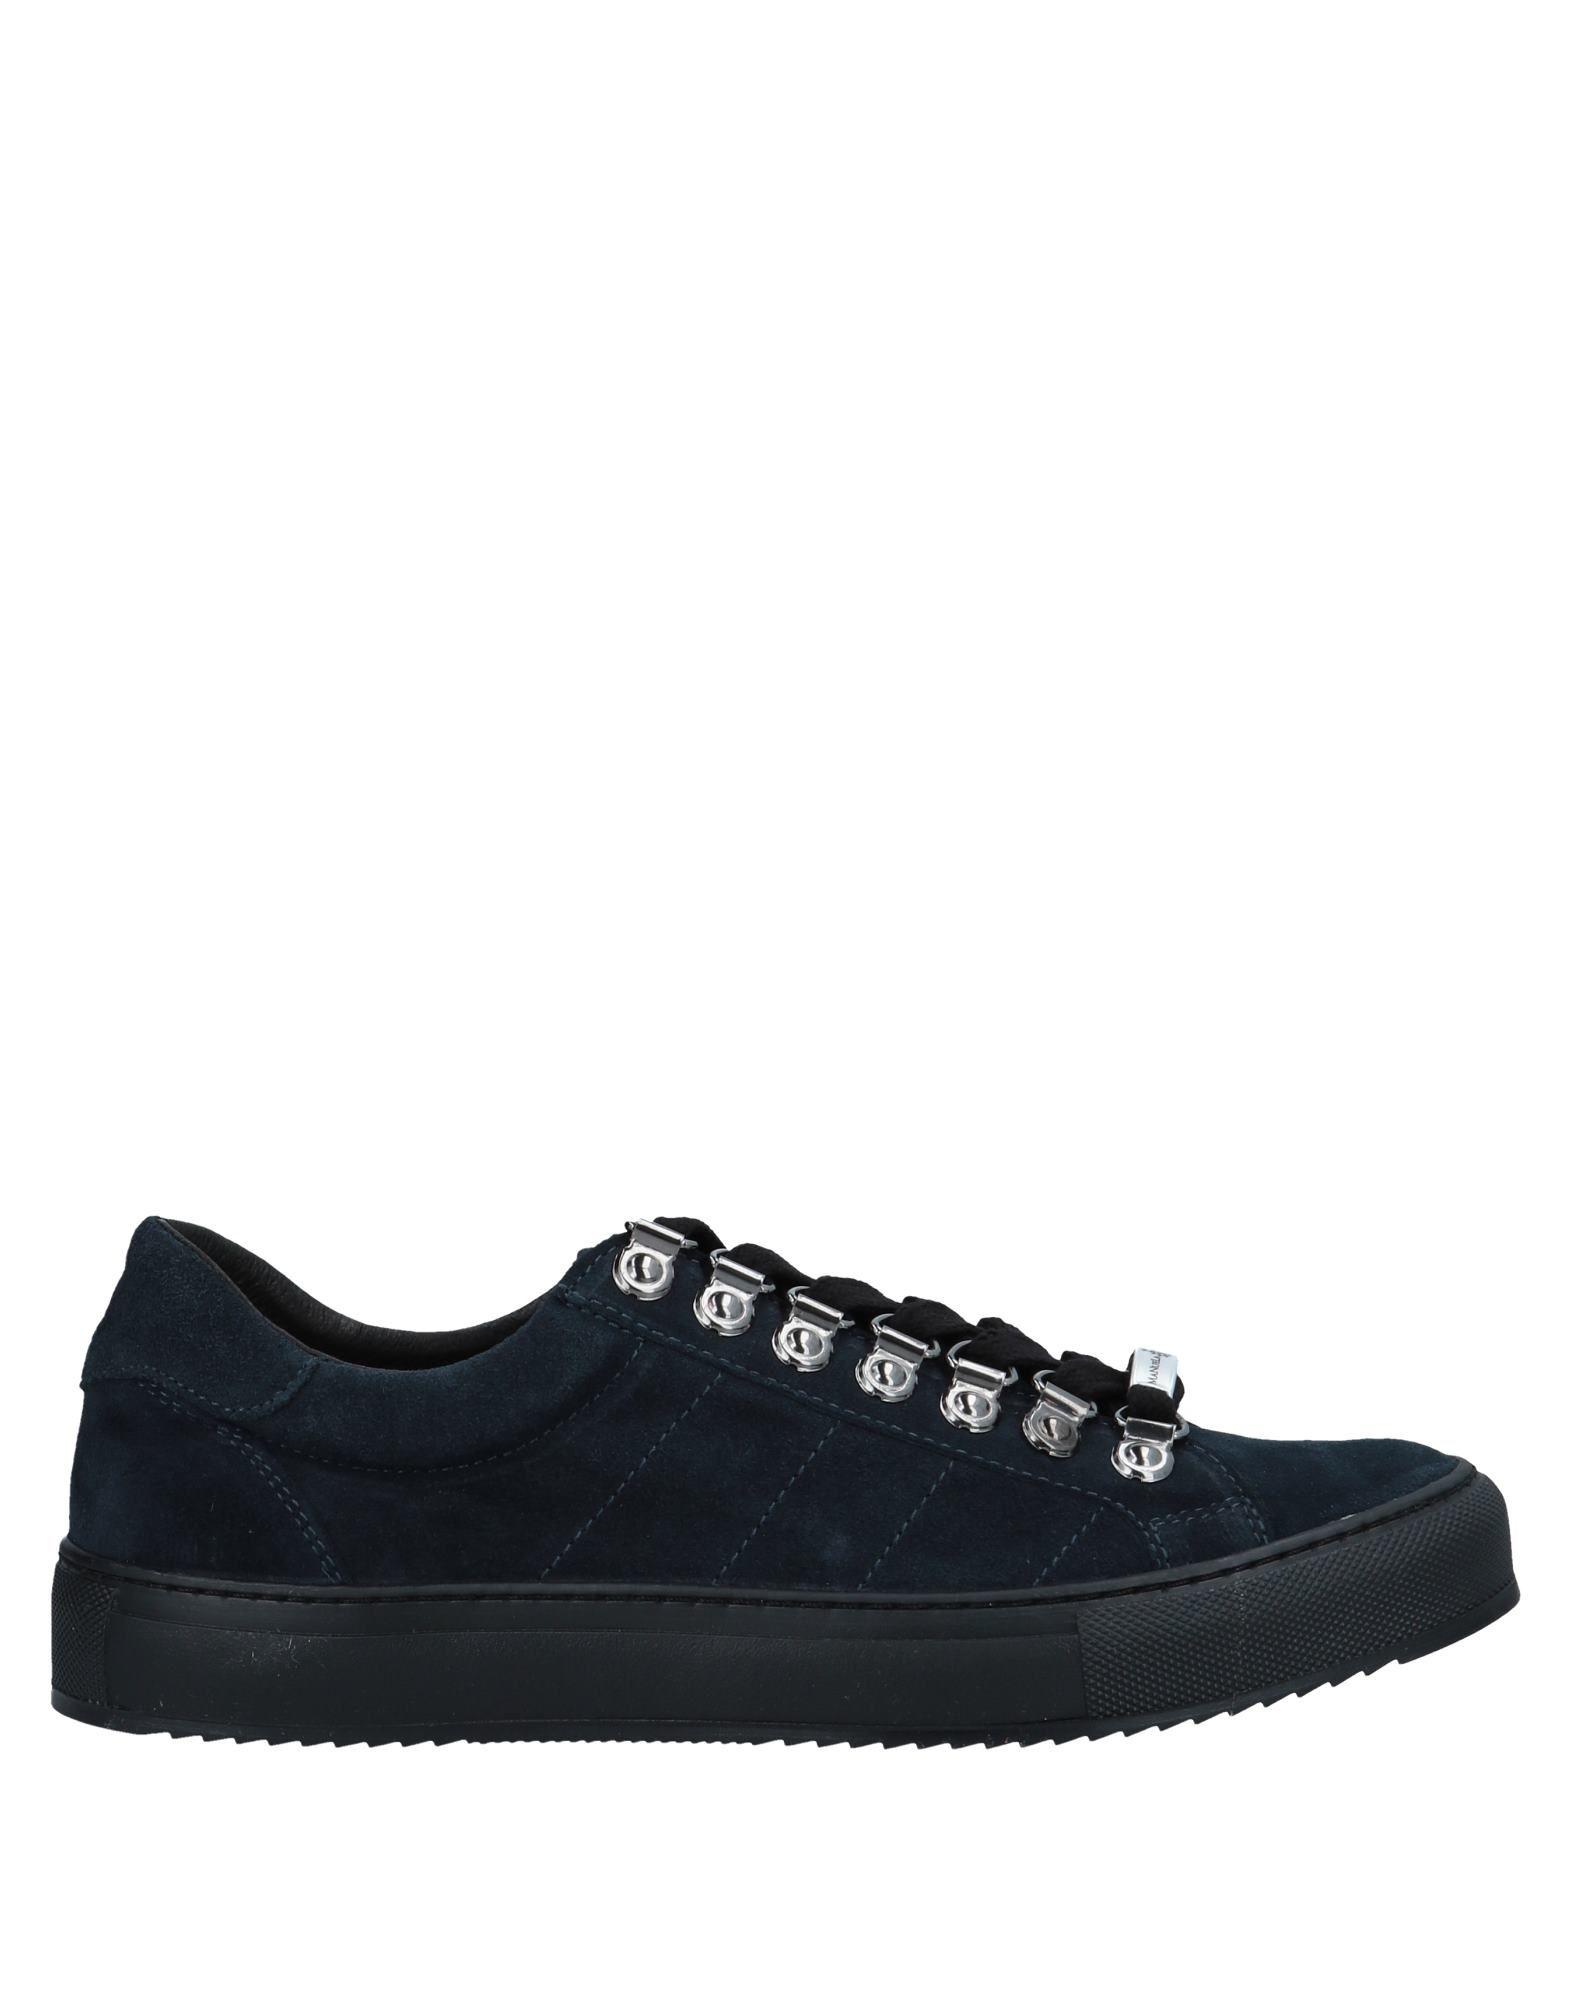 Rabatt echte Schuhe Manuela Dardozzi Sneakers Herren  11558326VE